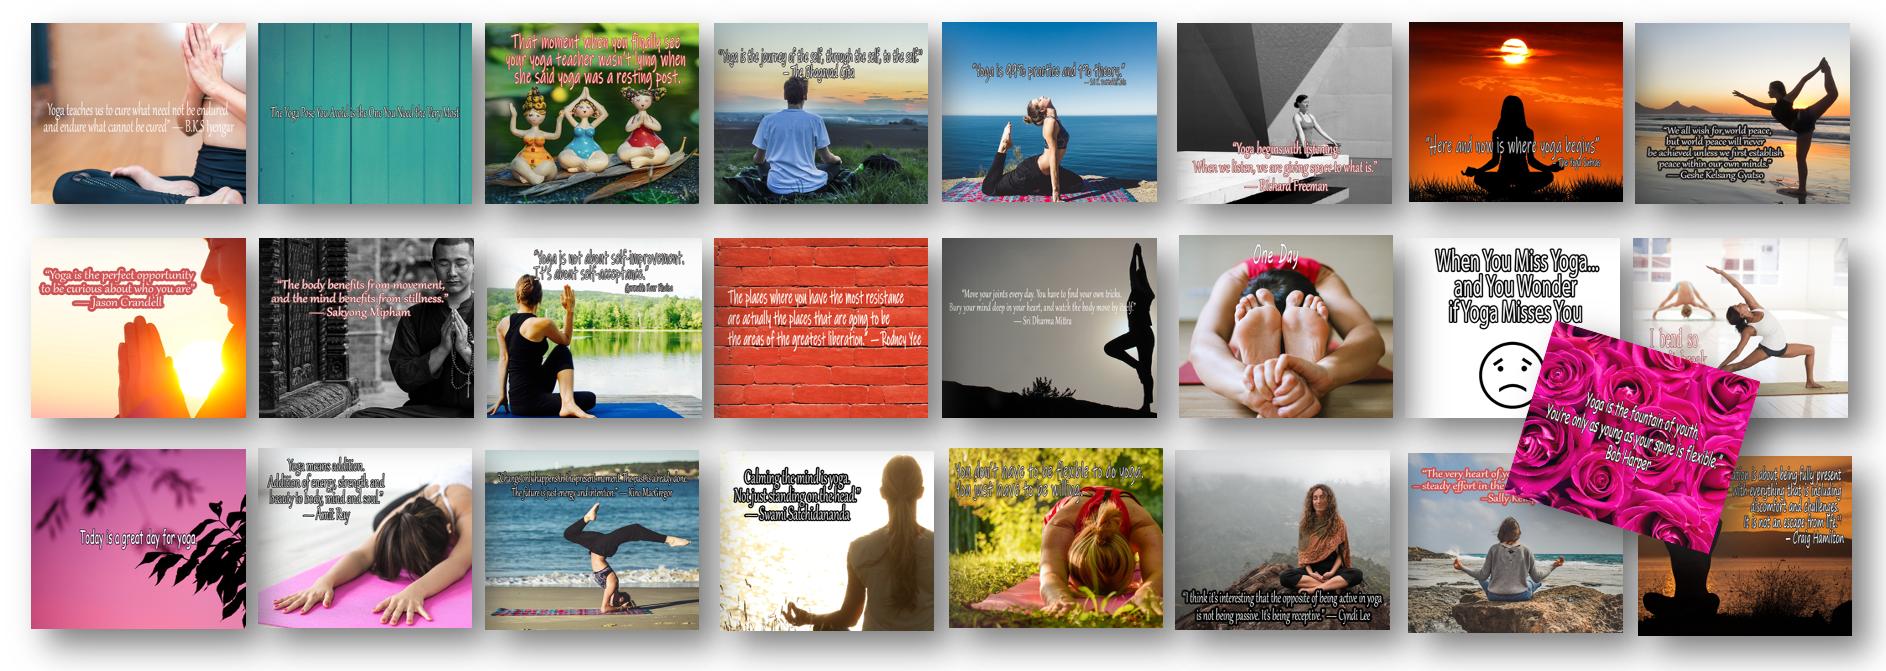 25 More Facebook Yoga Quotes